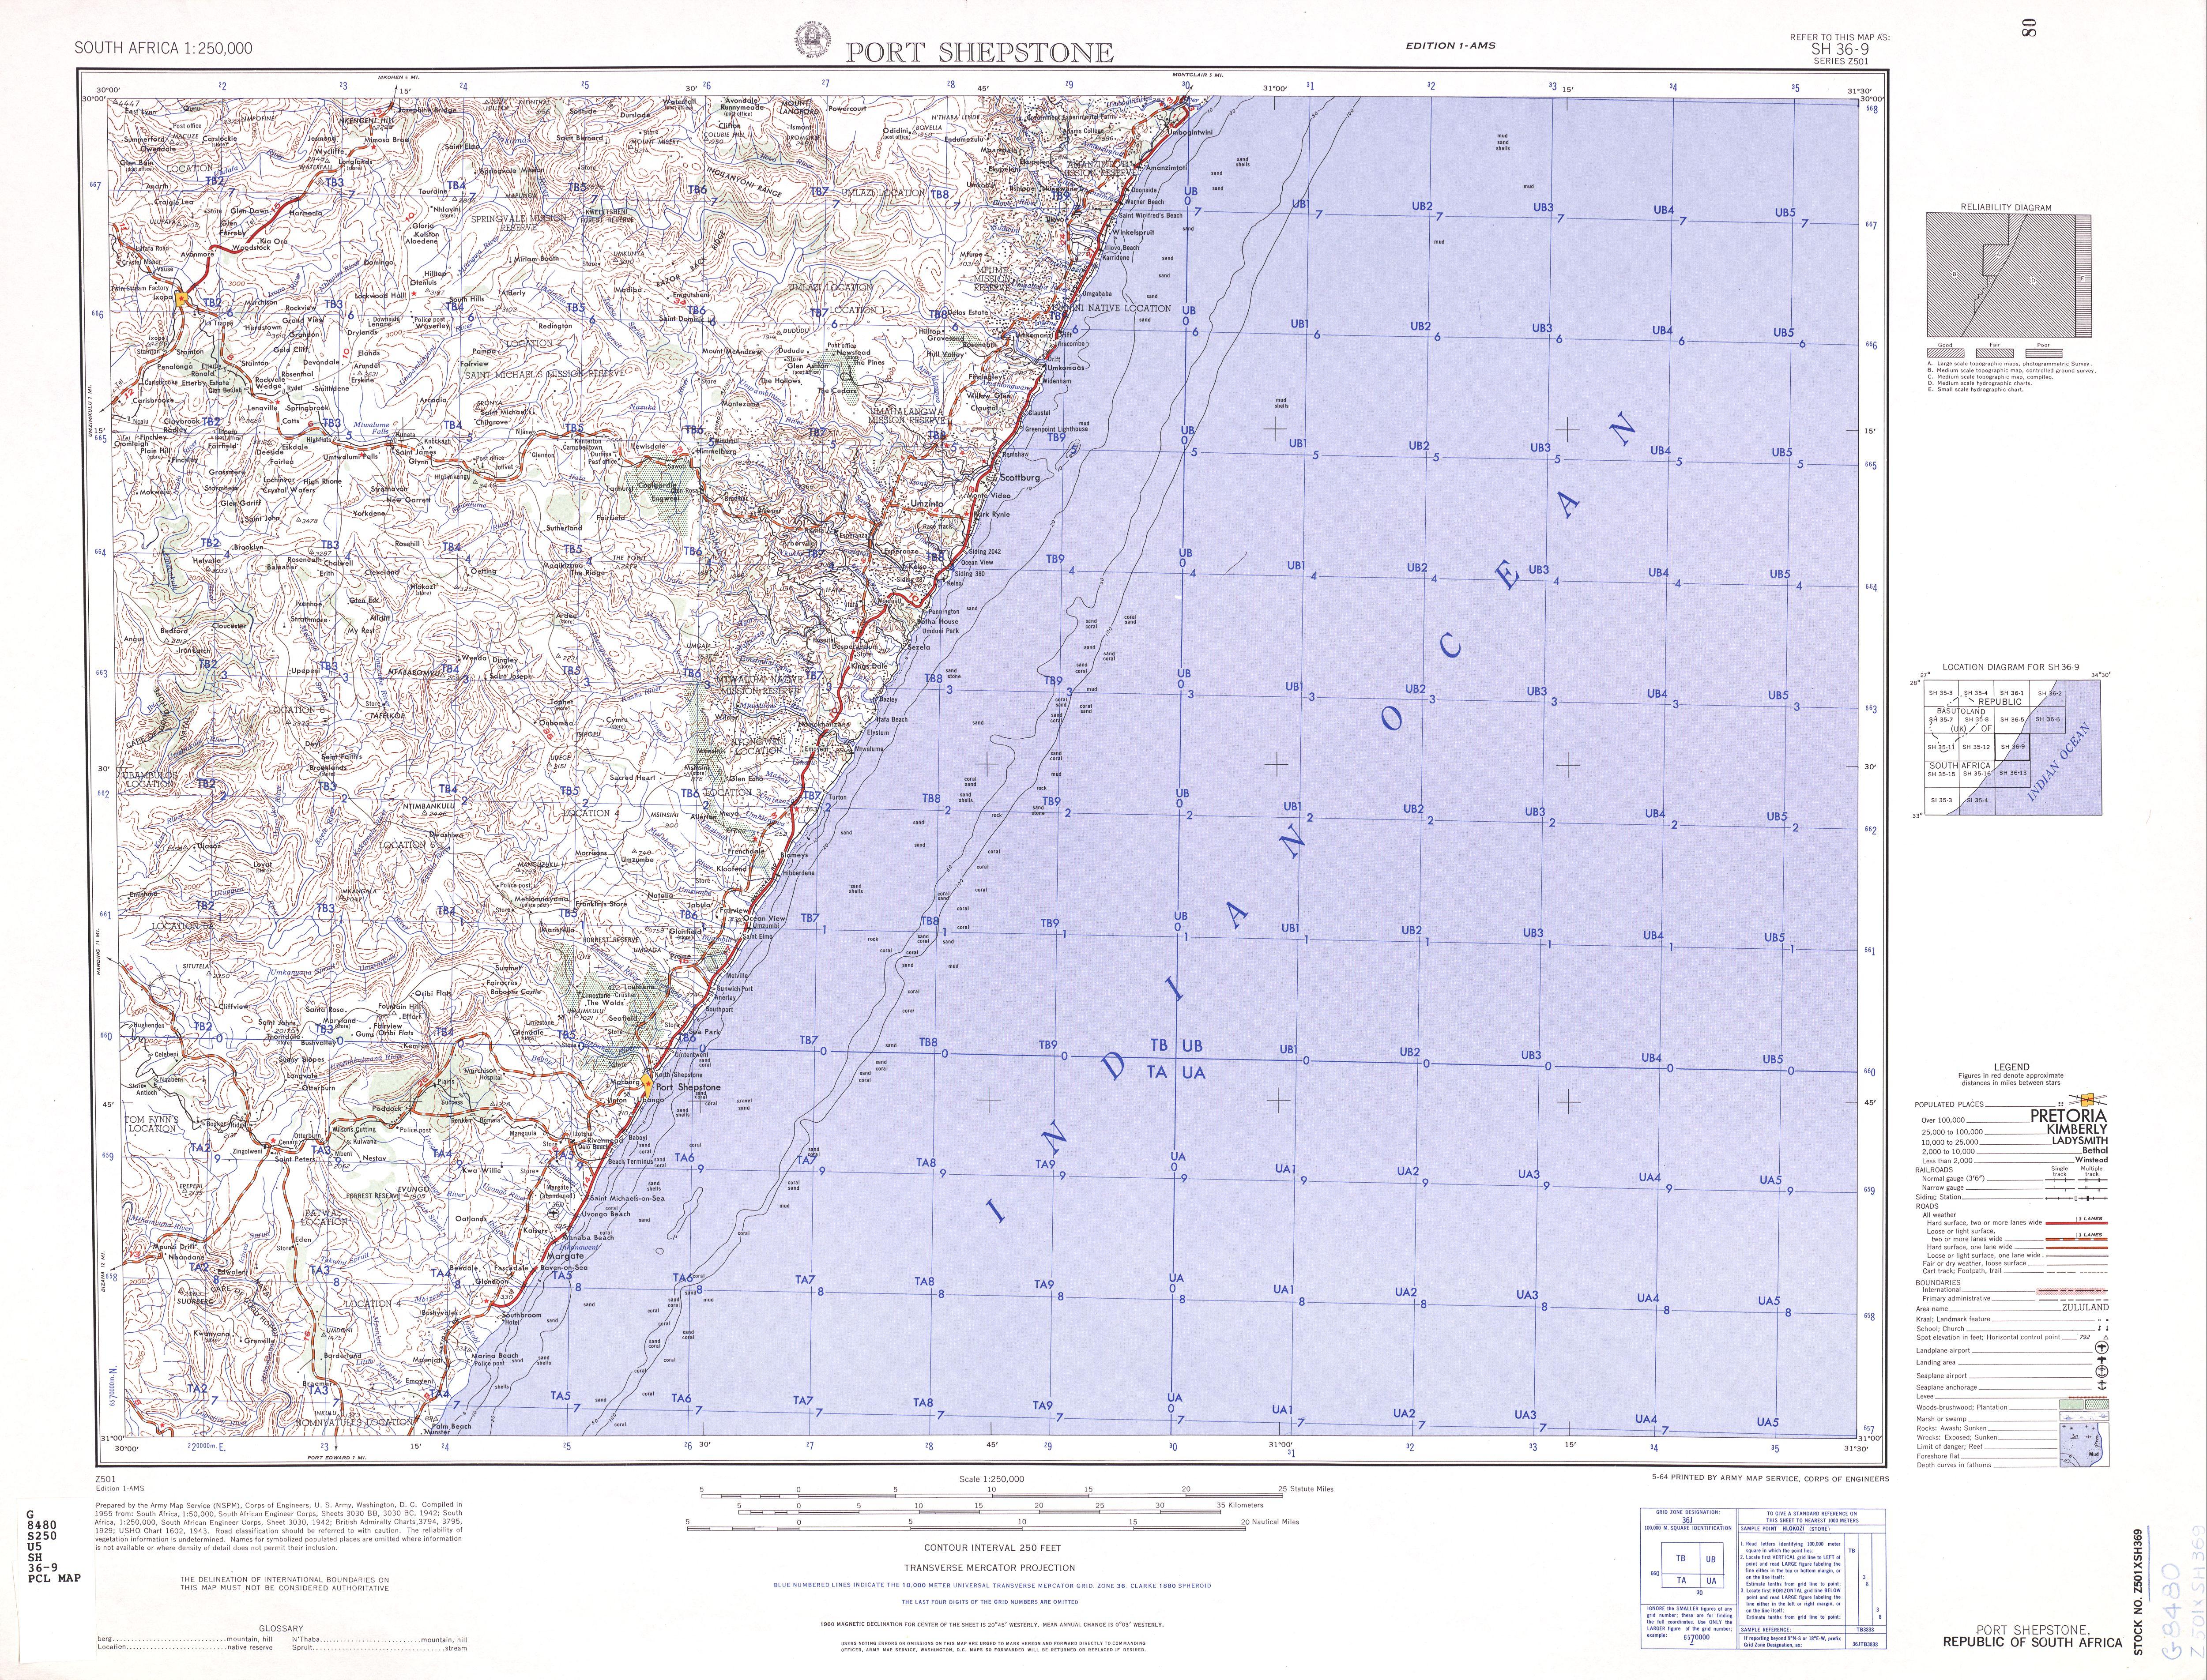 Hoja Port Shepstone del Mapa Topográfico de África Meridional 1954